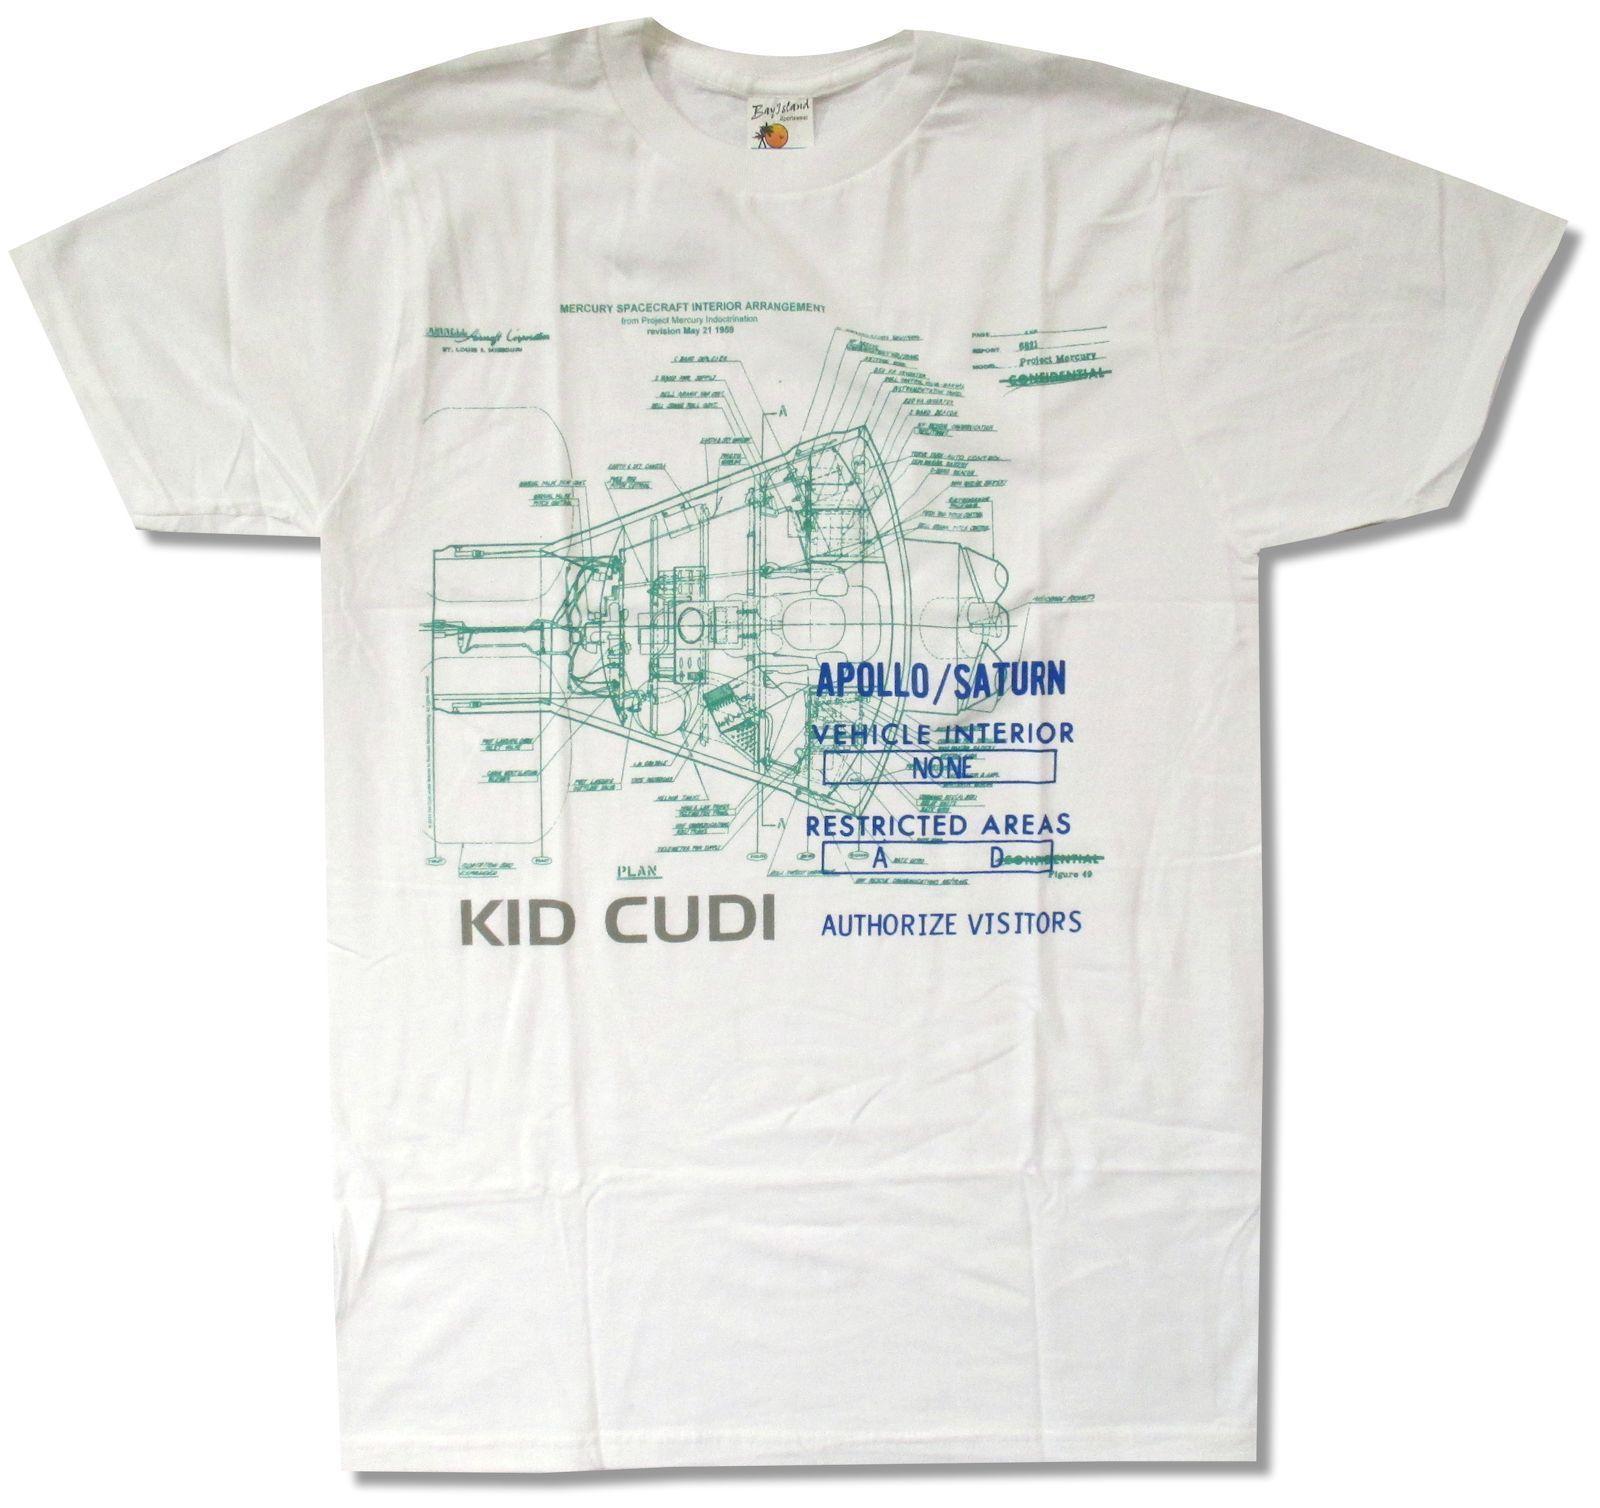 01309995 KID CUDI